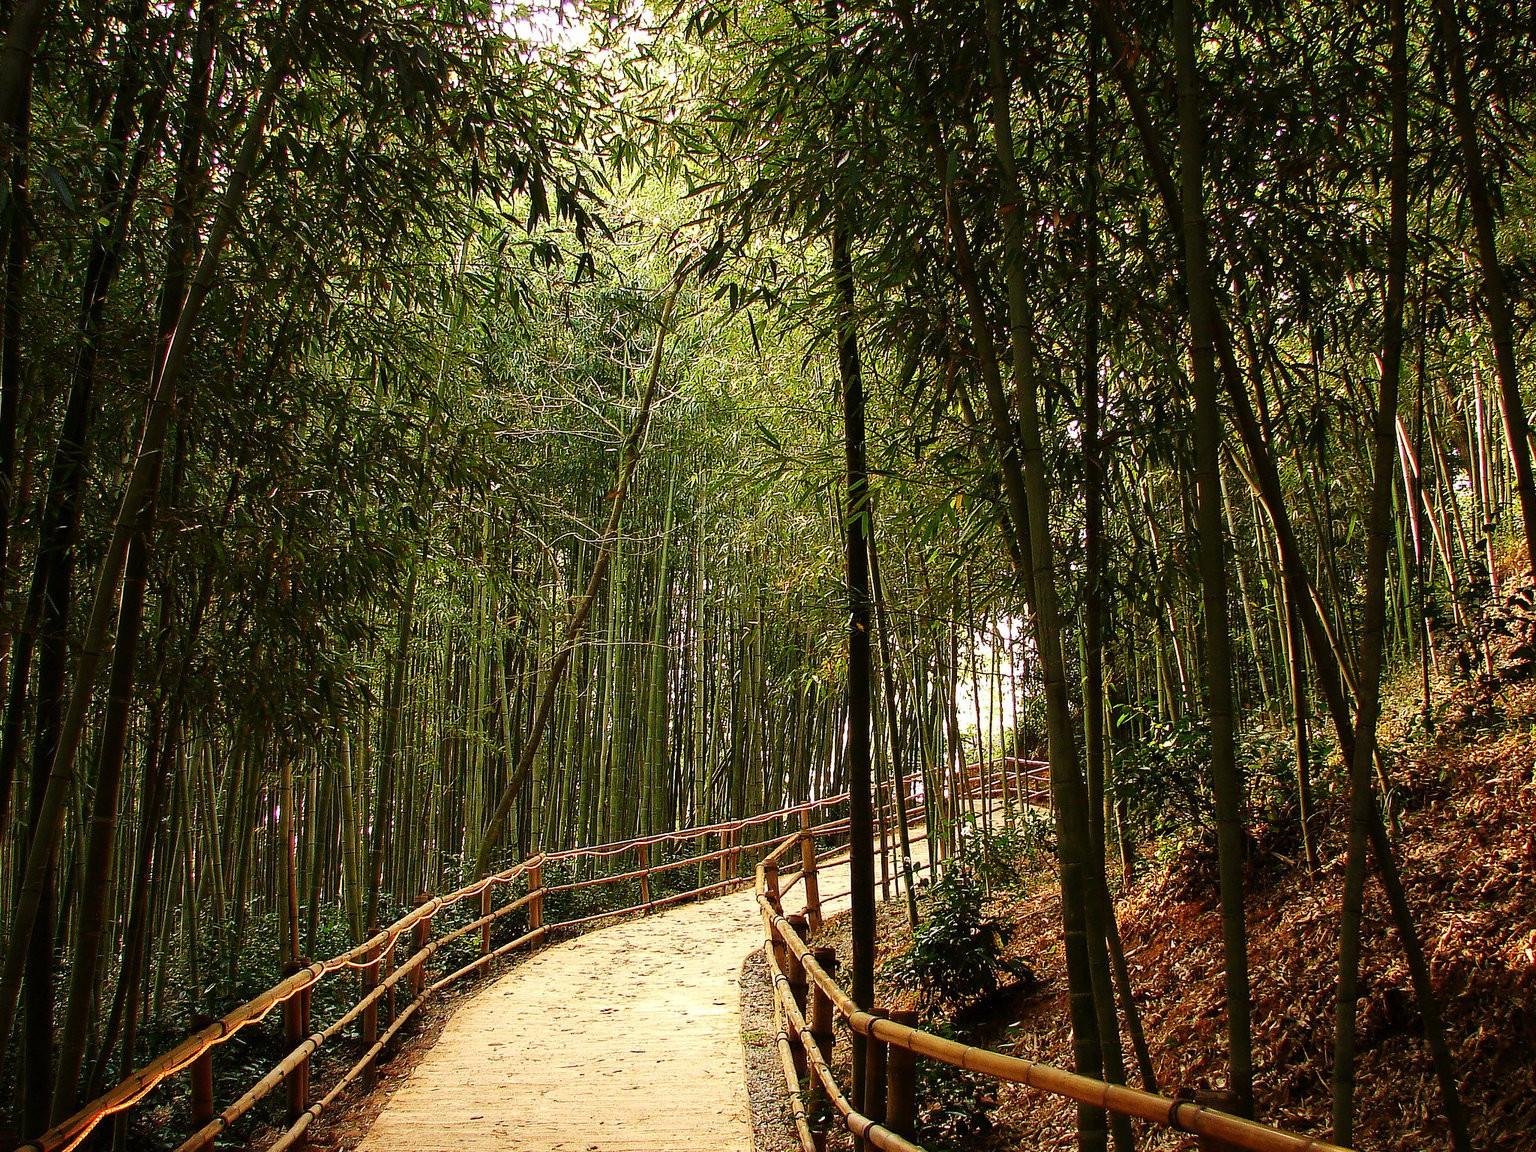 Damyang's Juknokwon (Bamboo Garden) | © Yeongcheol Lee / Flickr